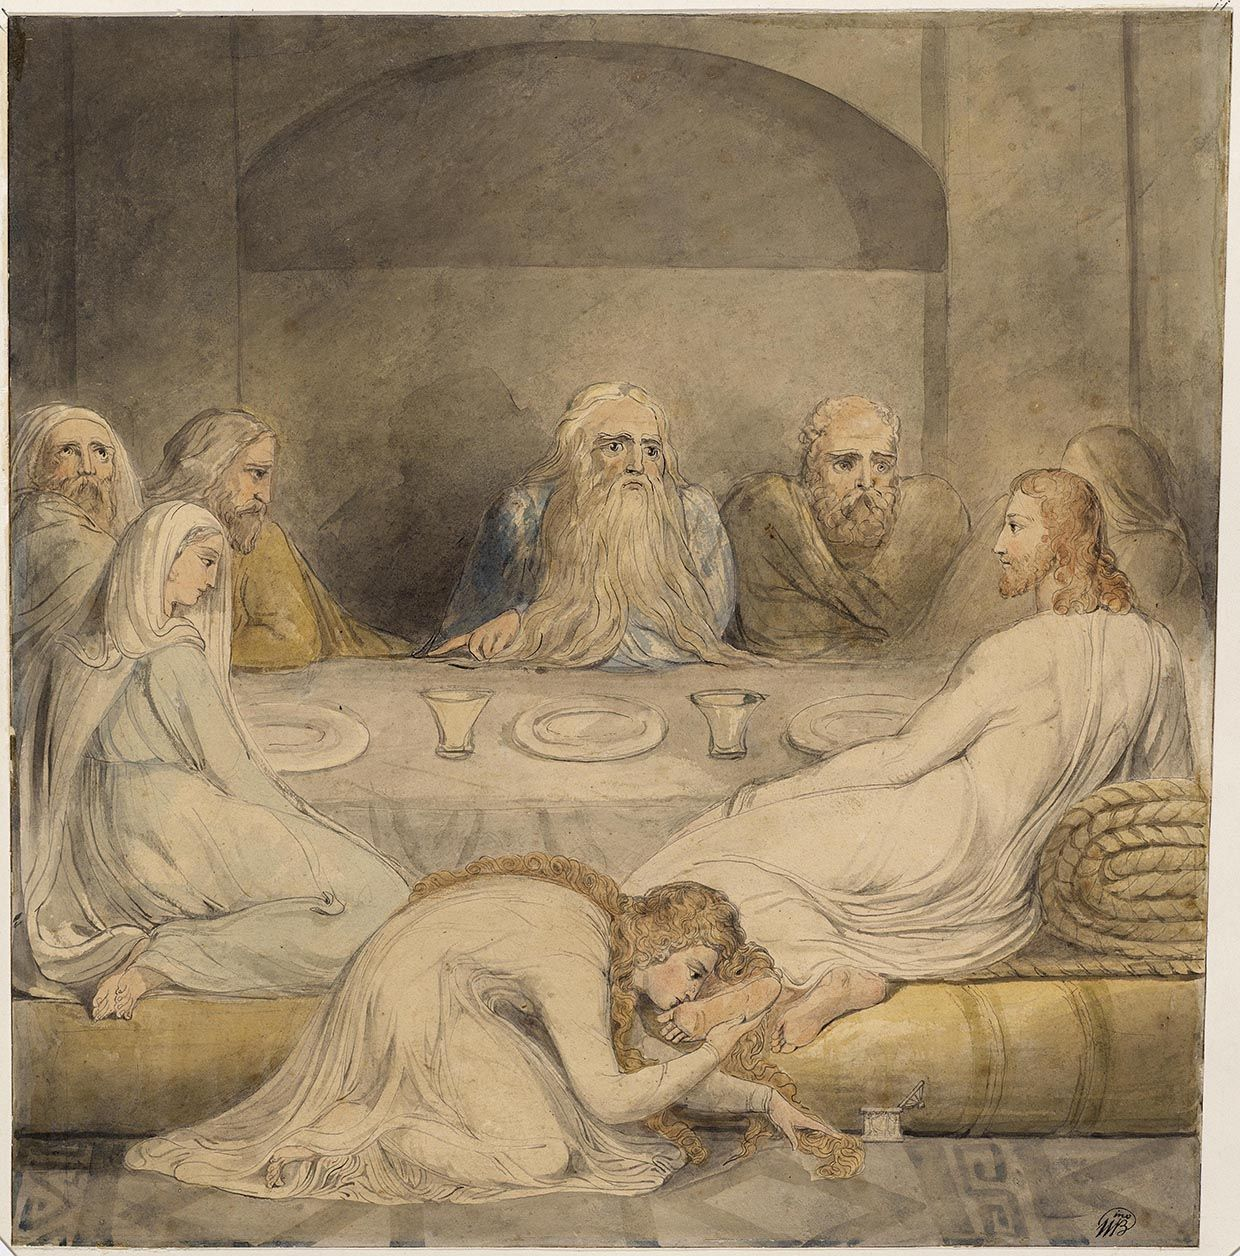 "William Blake: ""Mary Magdalene Washing Christ's Feet"" (c. 1803-05). Illustration for the Bible (New Testament), object 1 (Butlin 488). Pen, ink and water color. Philadelphia Museum of Art, Philadelphia, Pennsylvania, USA"